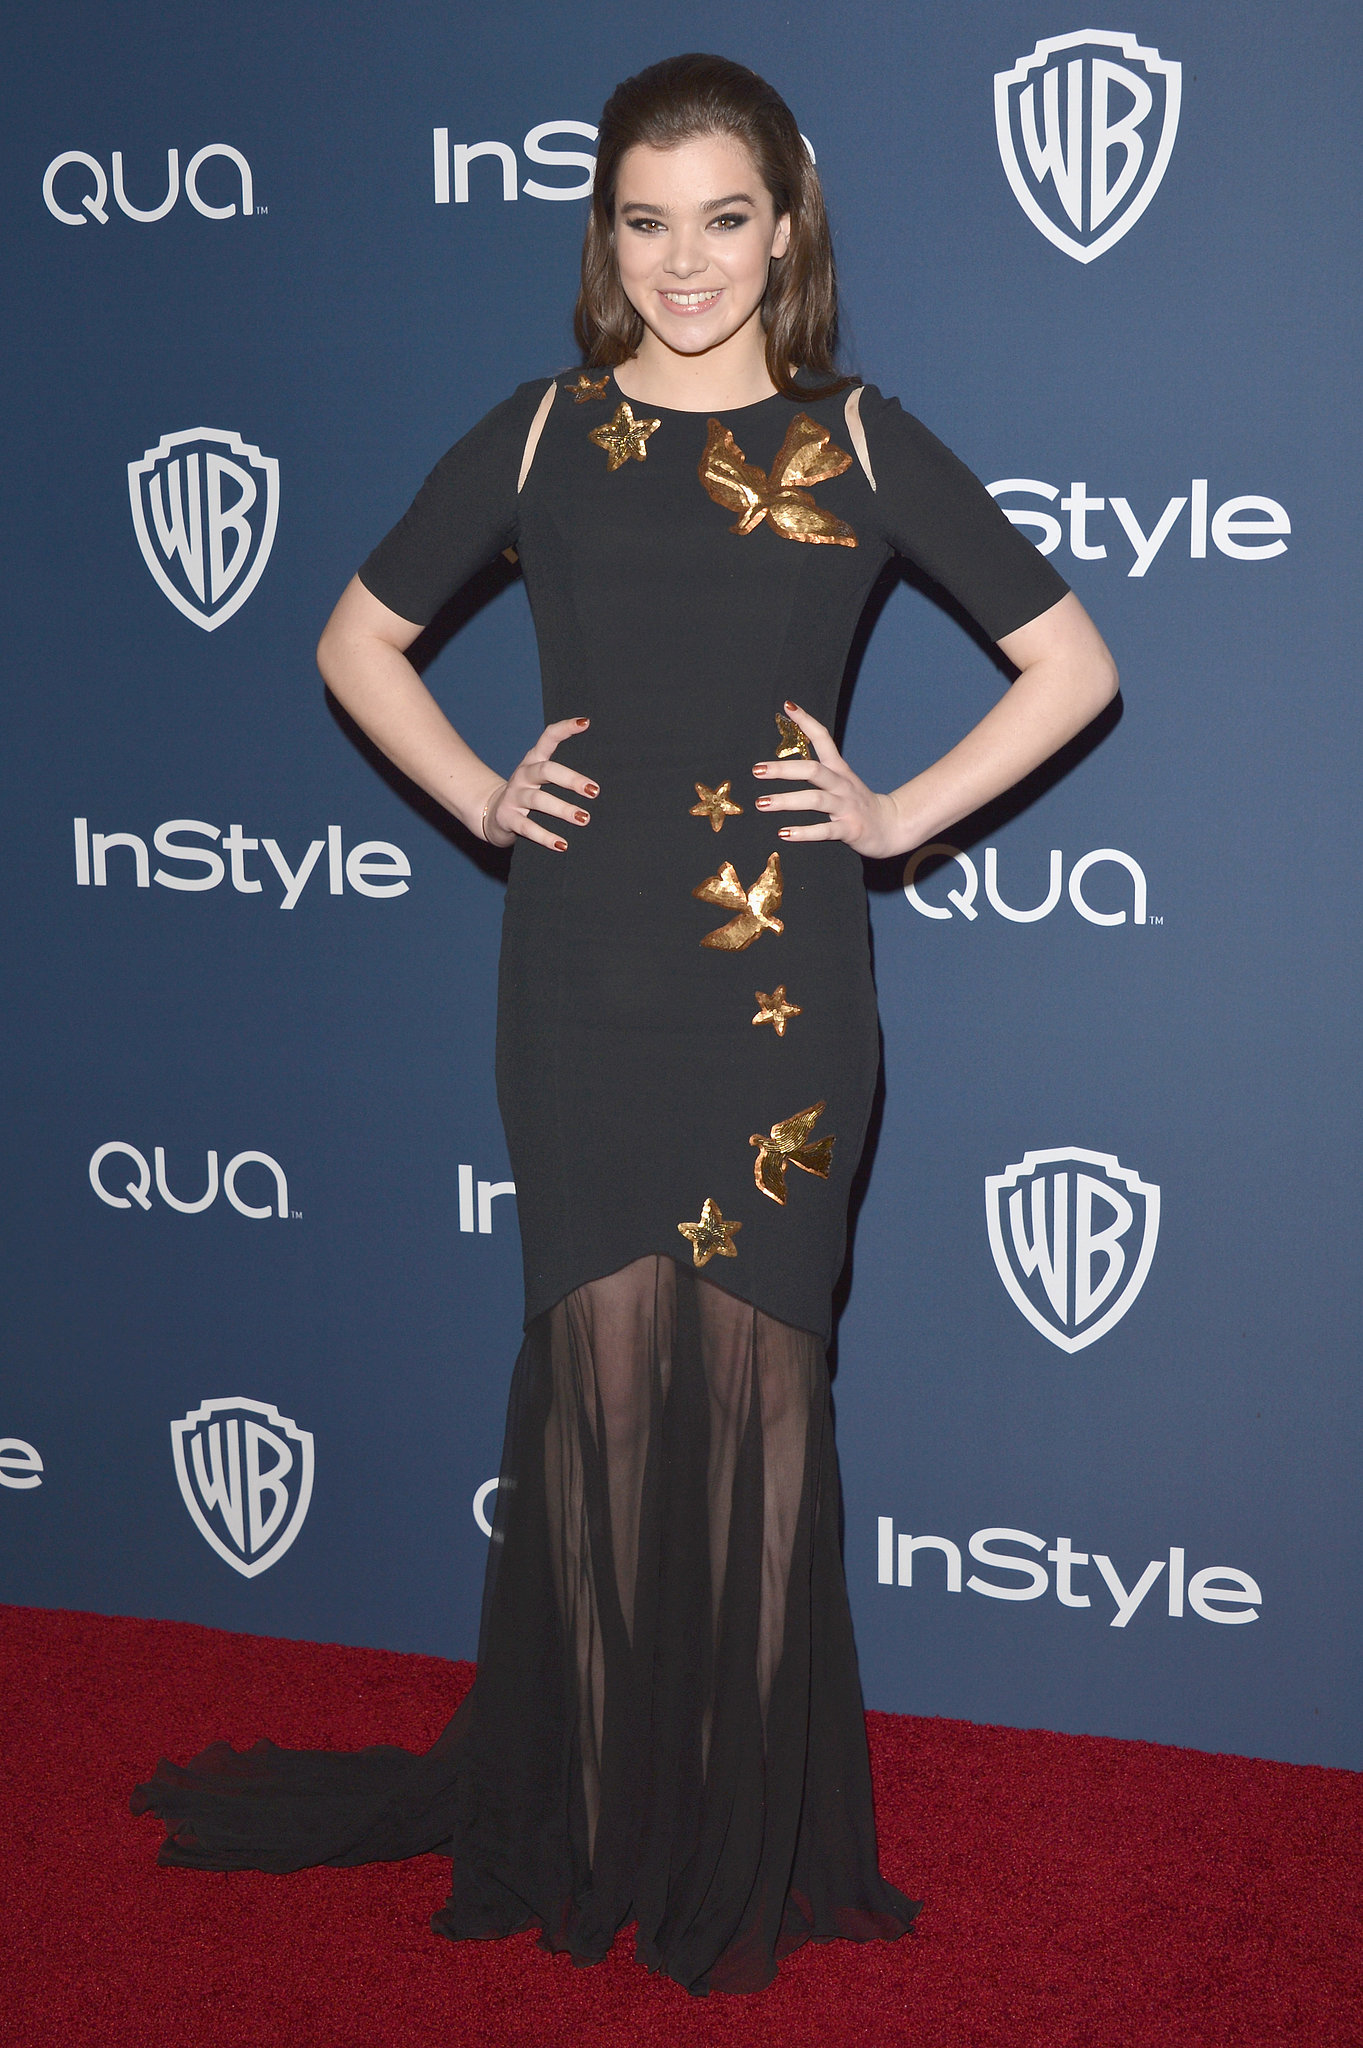 Hailee Steinfeld wore an Andrew Gn dress.